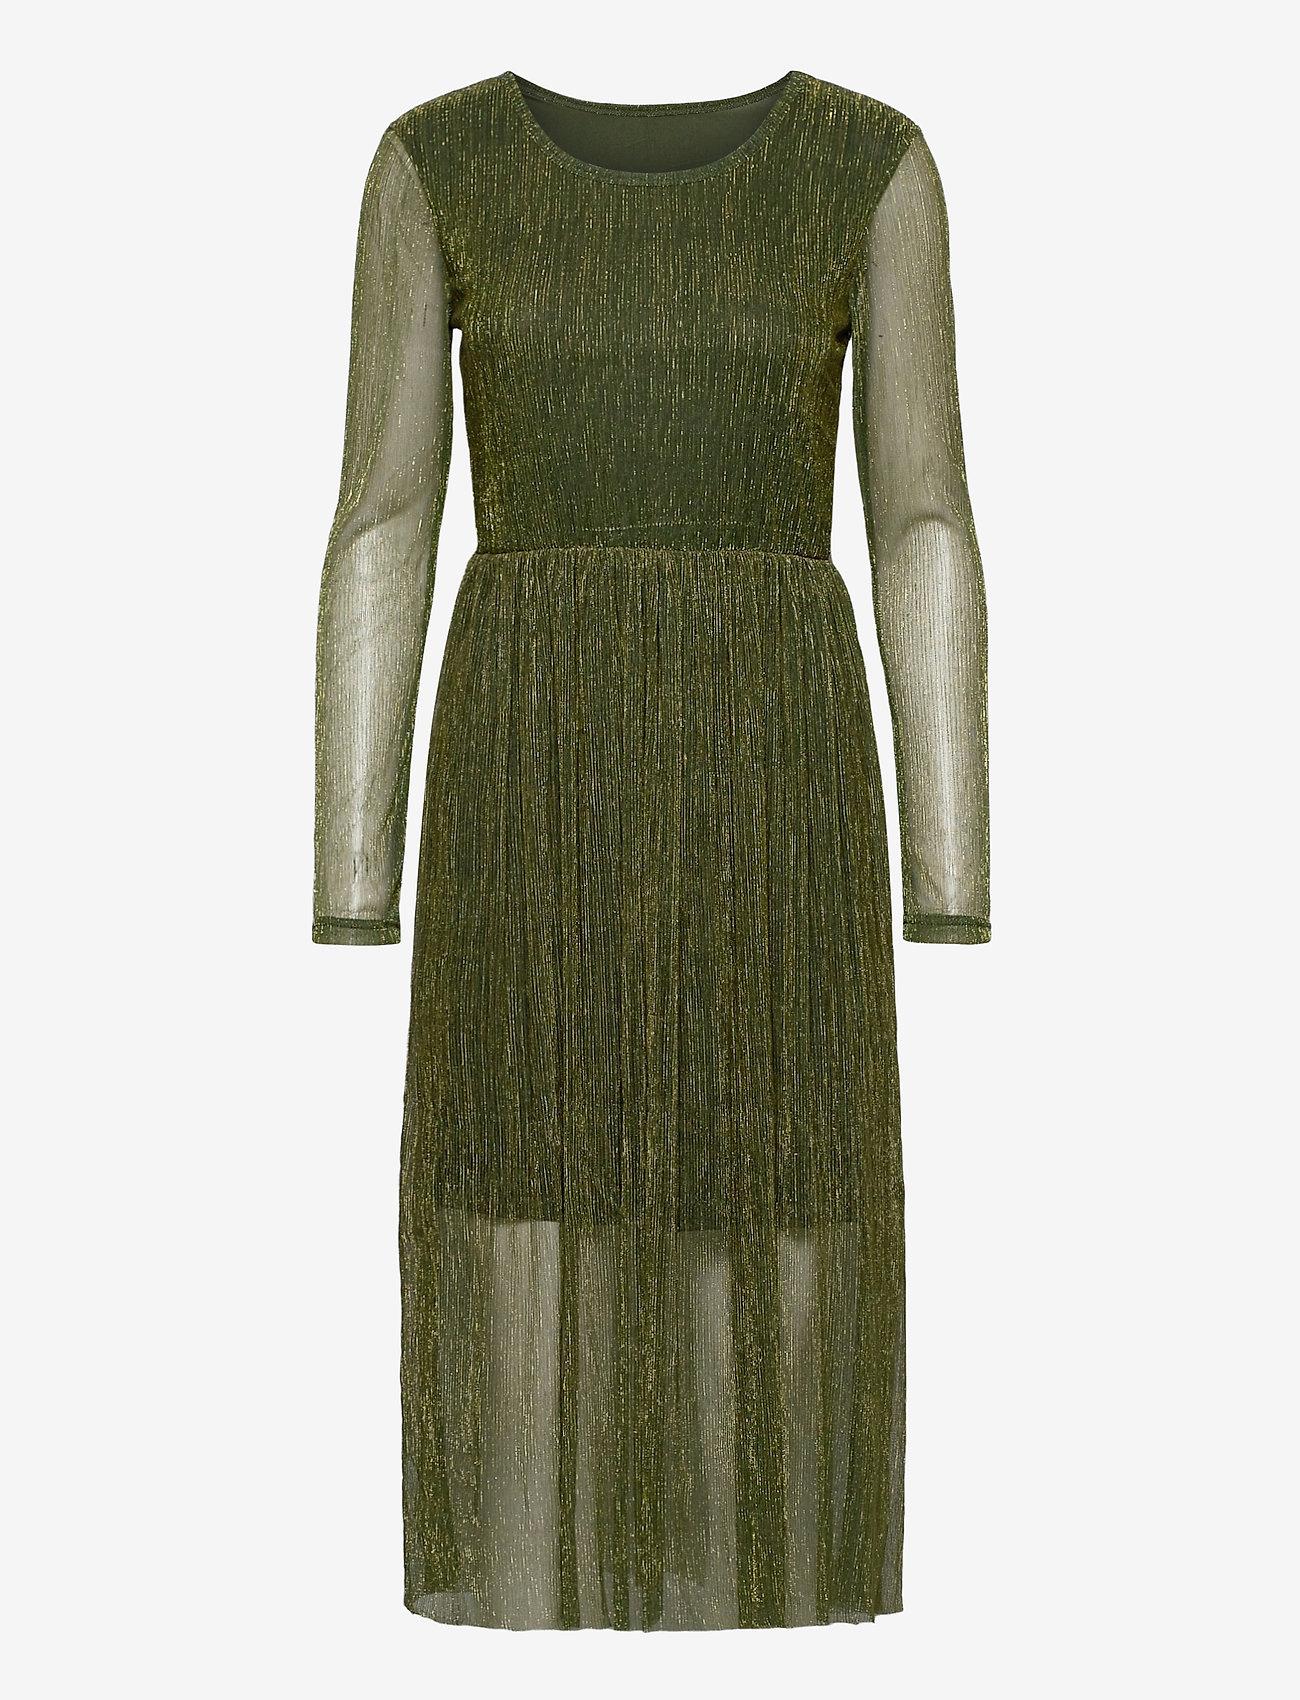 ICHI - IHJAKOBINE DR - midi dresses - kombu green - 0